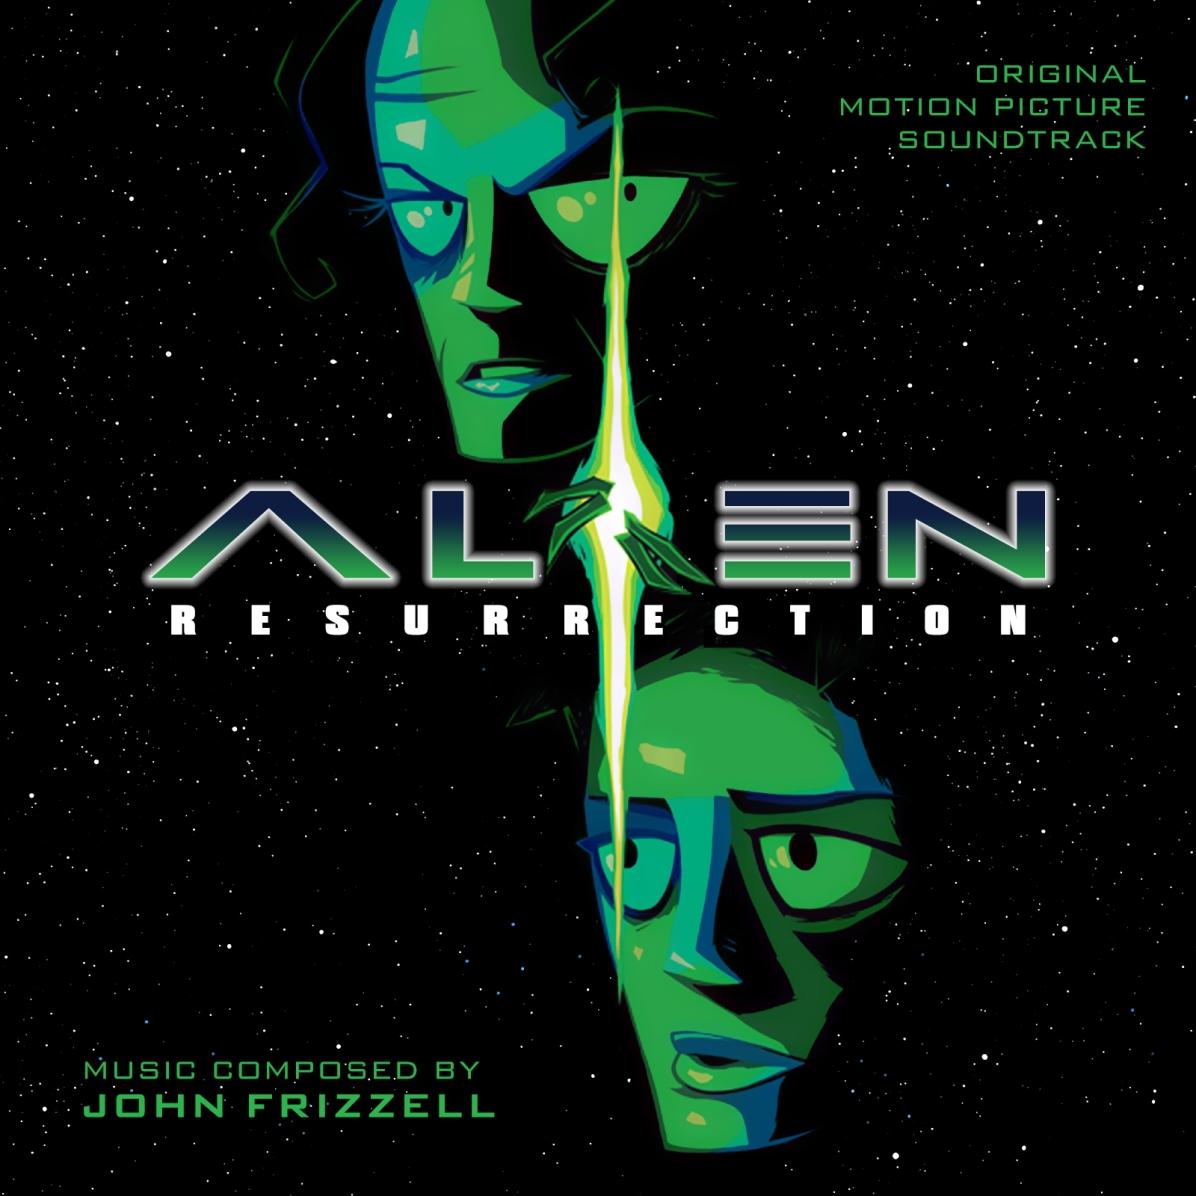 #15: Alien Resurrection (Remake)